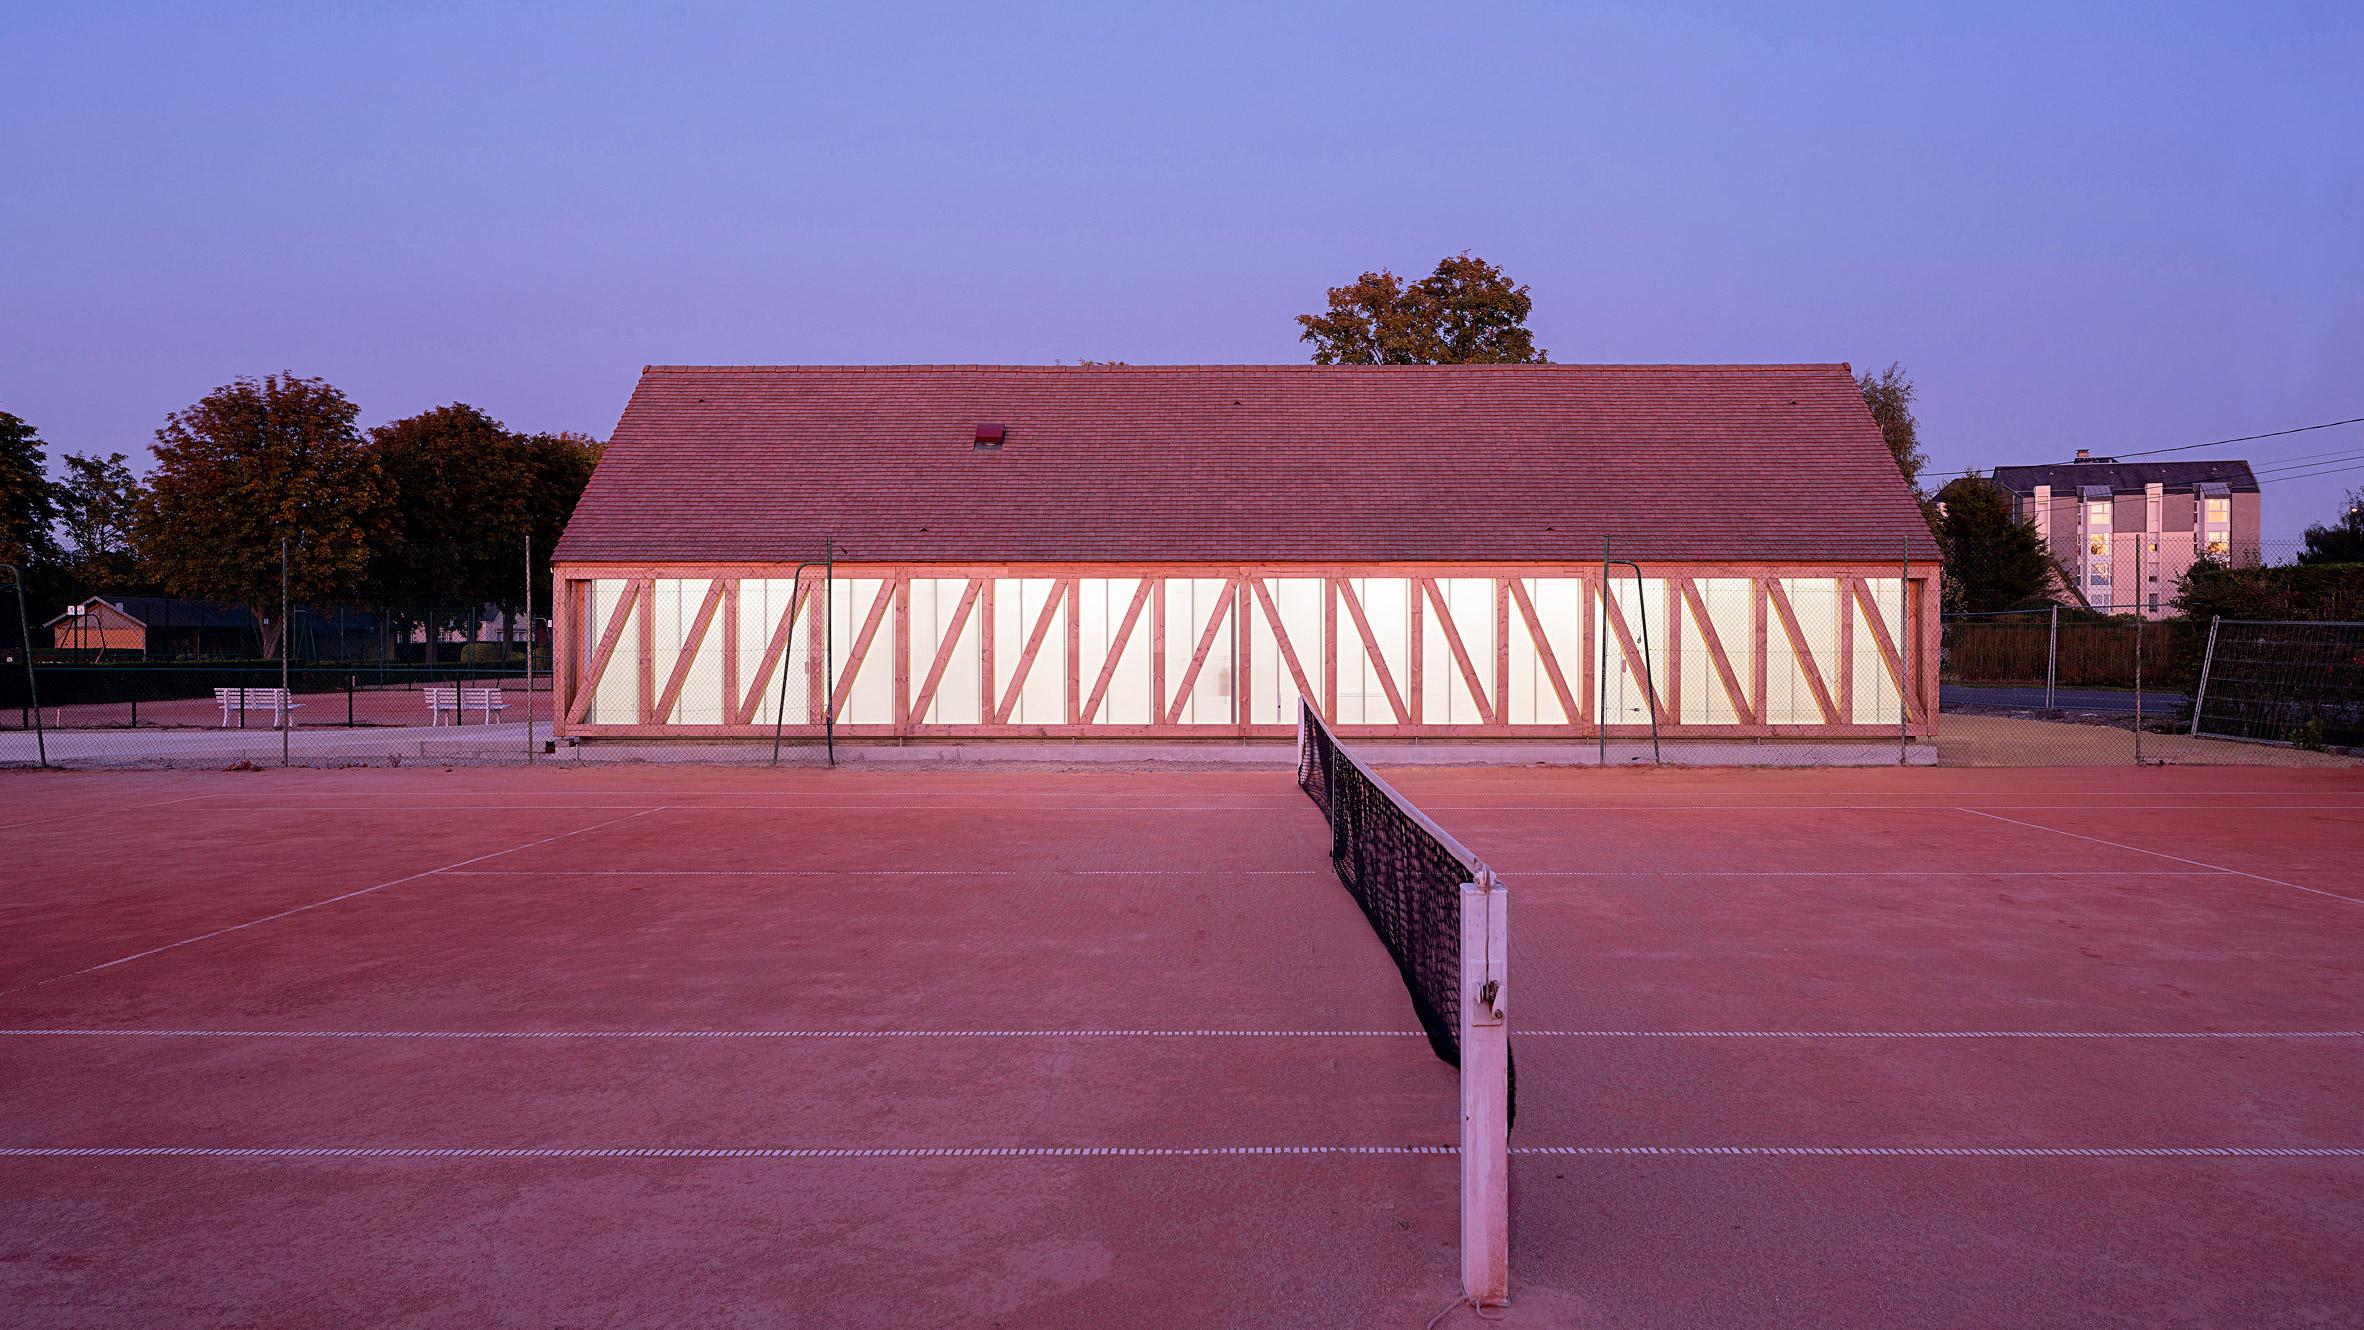 Lemoal Lemoal Architectes builds translucent half-timbered tennis pavilion